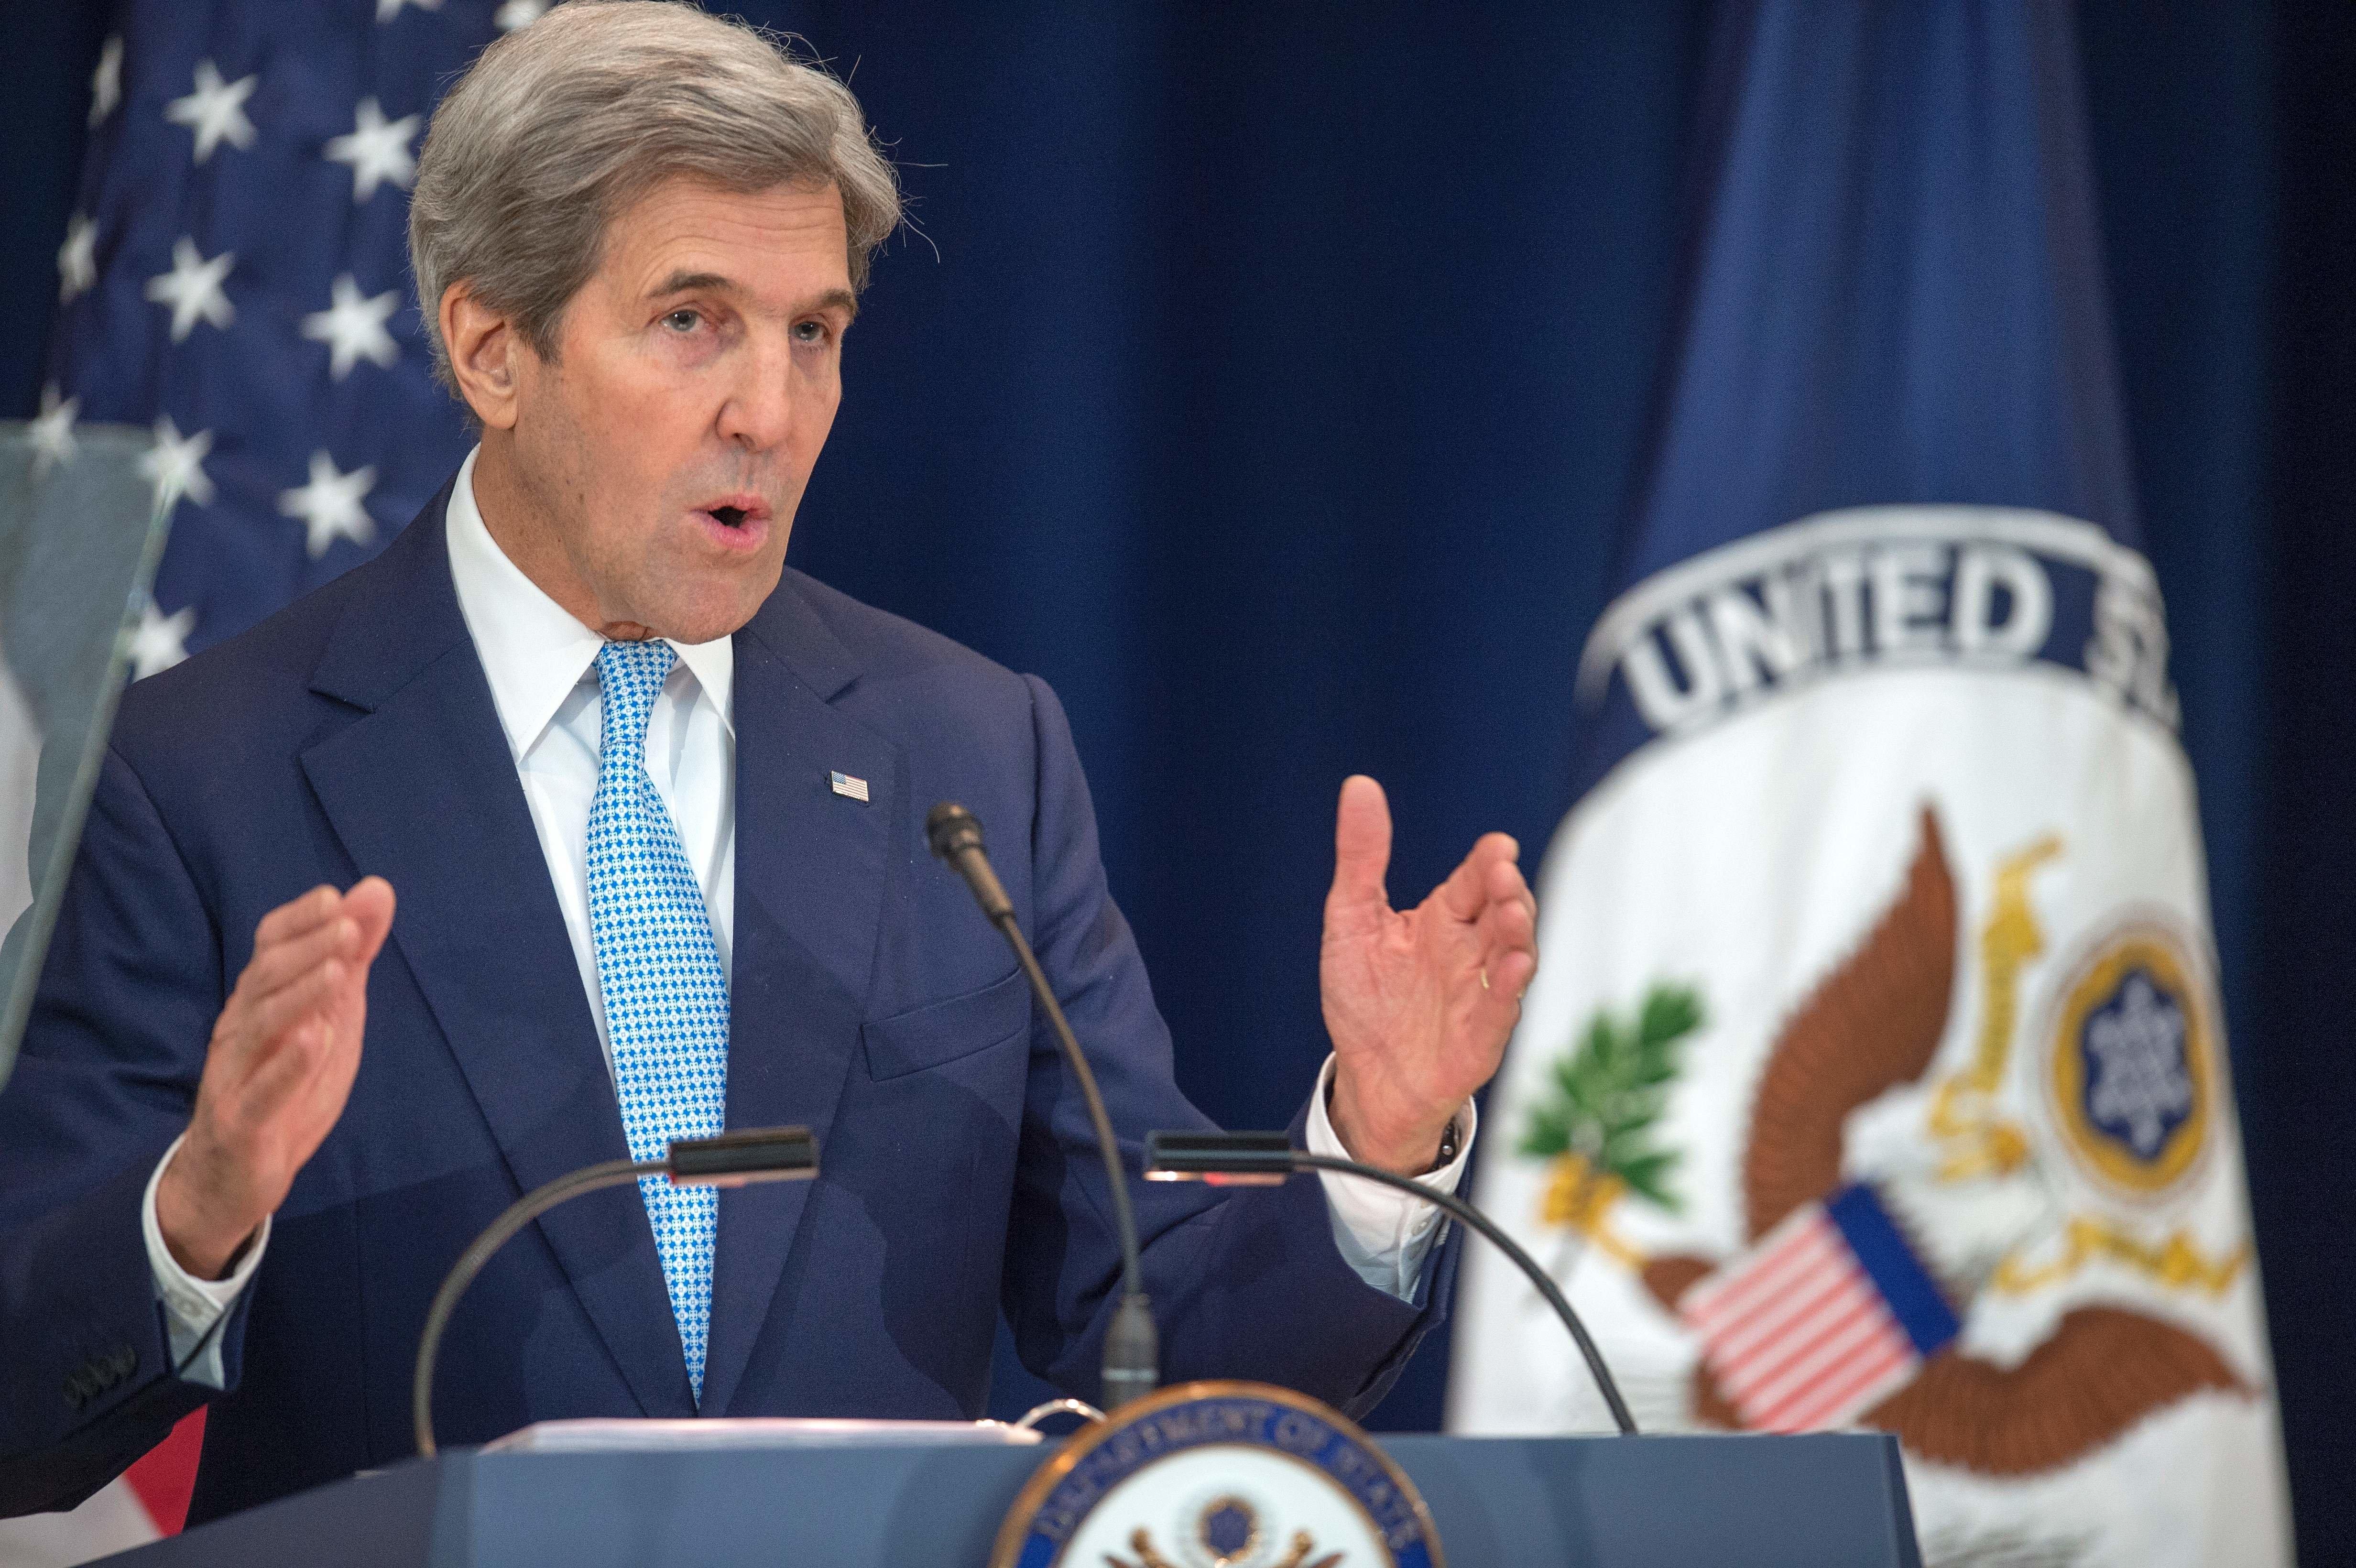 Kerry Issues Dire Warning On Israeli Settlements Ahead Of Trump's